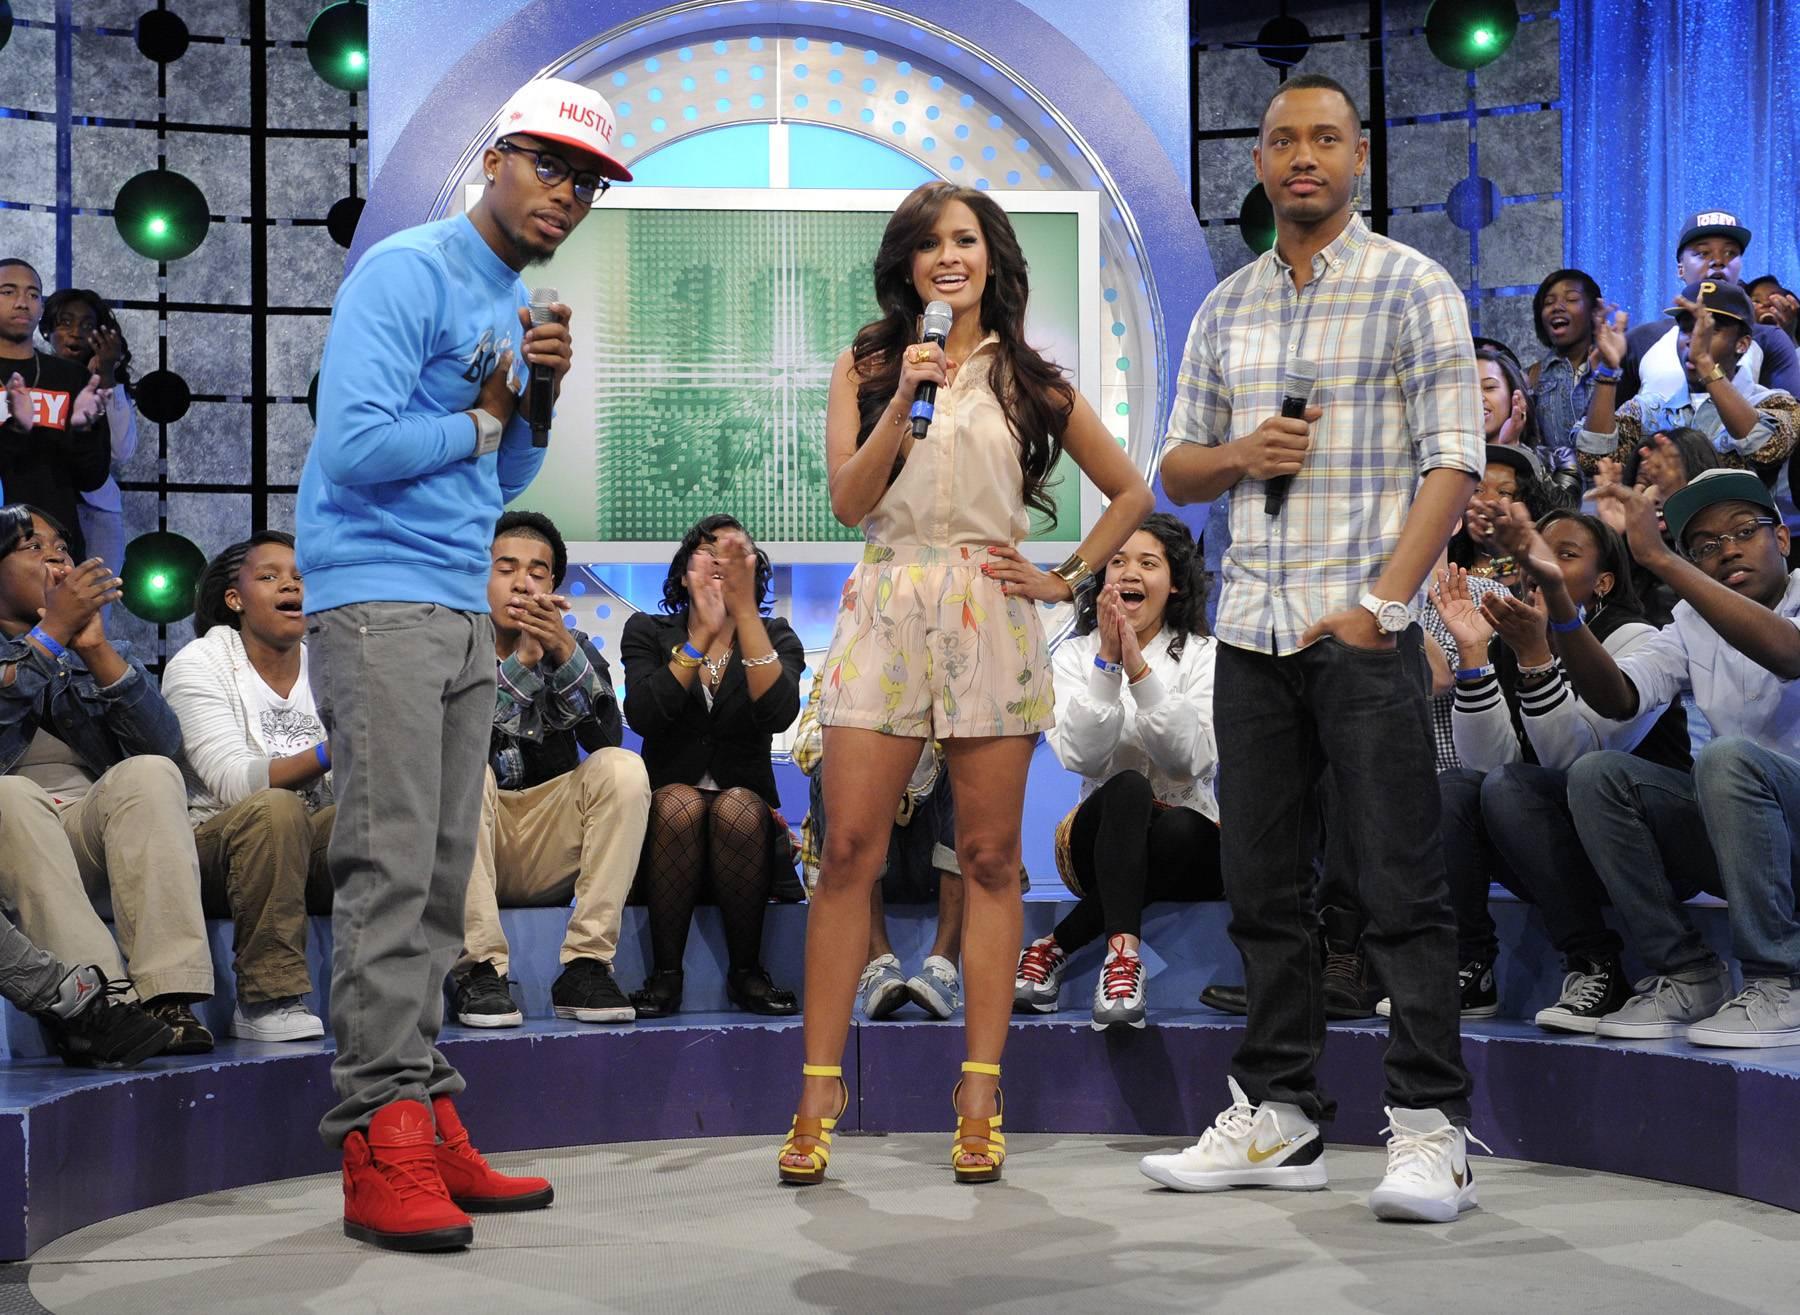 Lets Roll - B.o.B with Rocsi Diaz and Terrence J at 106 & Park, May 1, 2012. (Photo: John Ricard / BET)